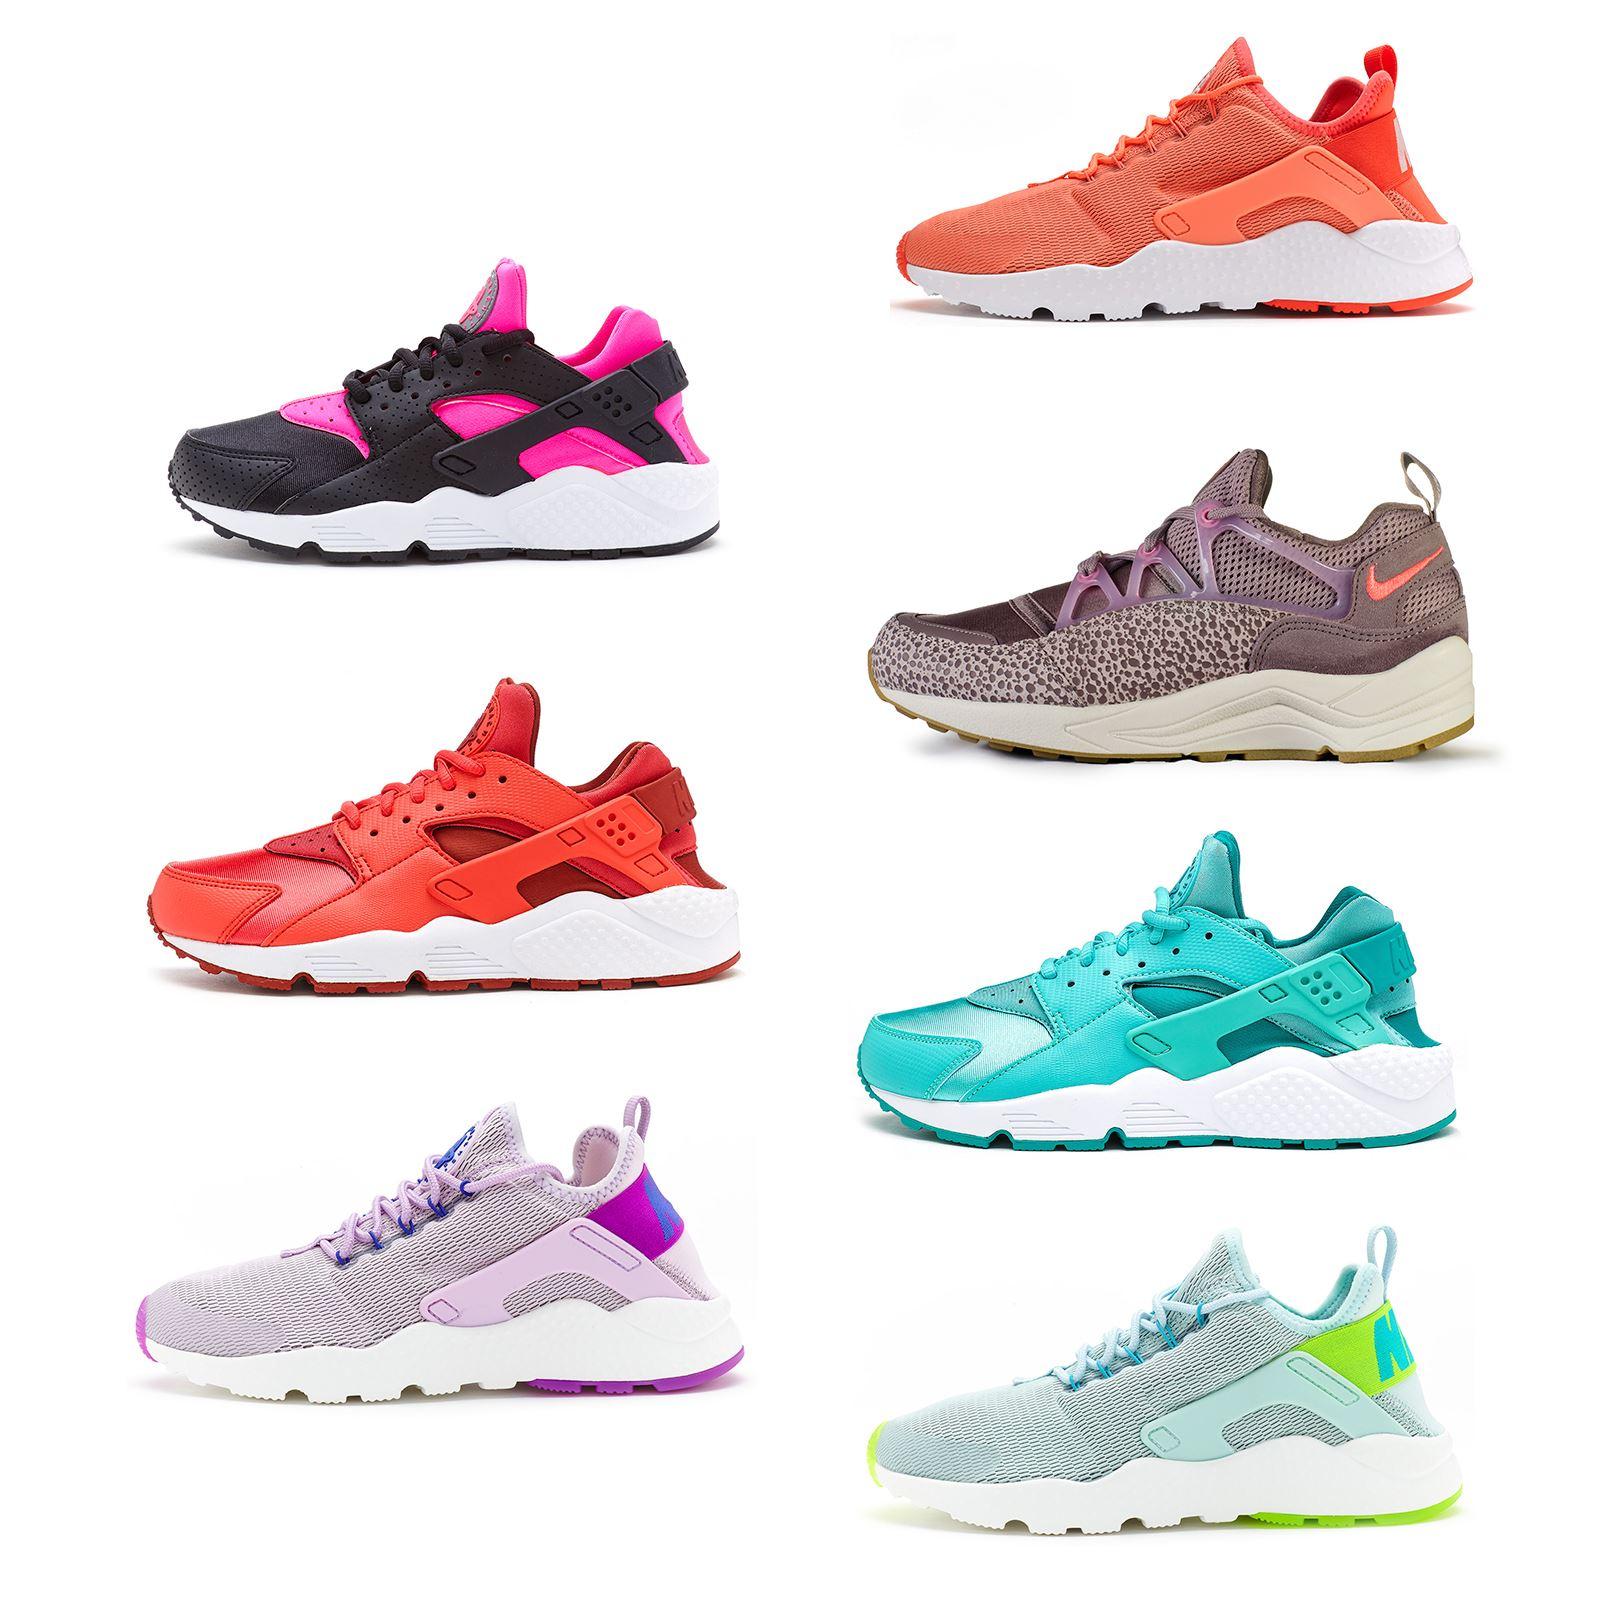 988e463000151 Nike Luft Huarache Damen Laufen Sportschuhe in Alle Größen